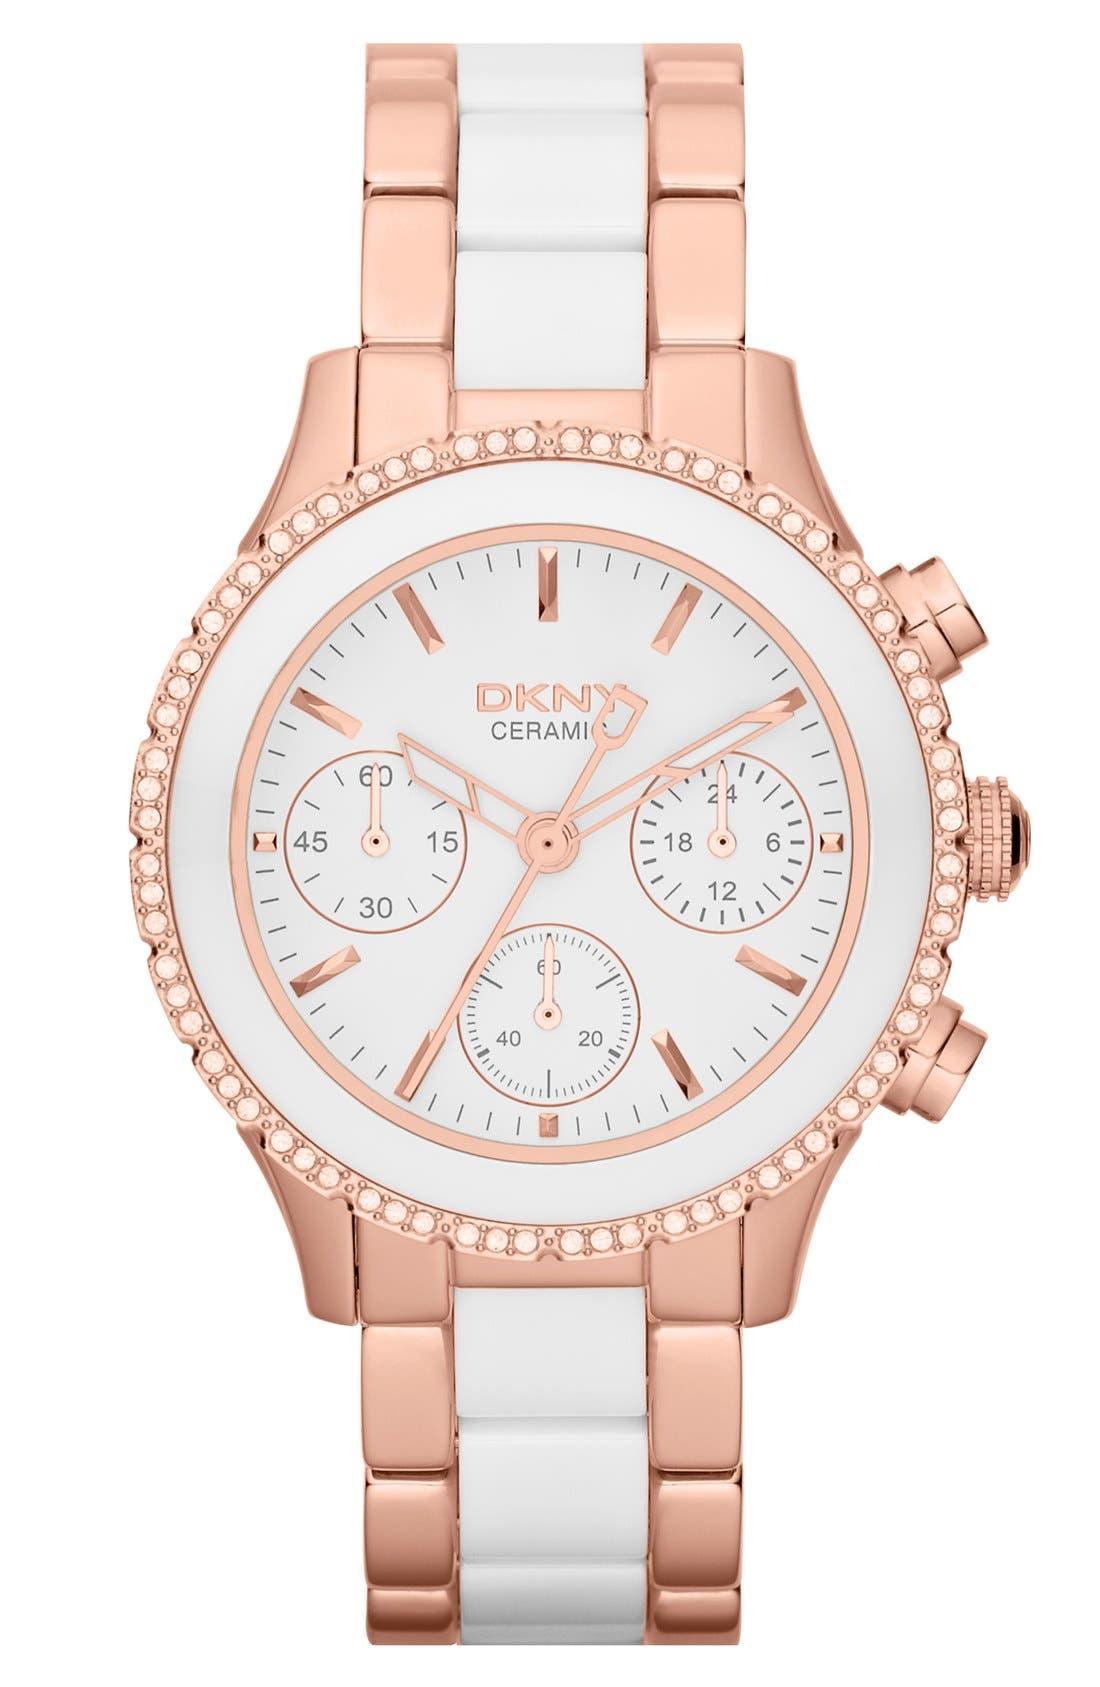 Alternate Image 1 Selected - DKNY 'Westside' Crystal Bezel Chronograph Ceramic Bracelet Watch, 38mm